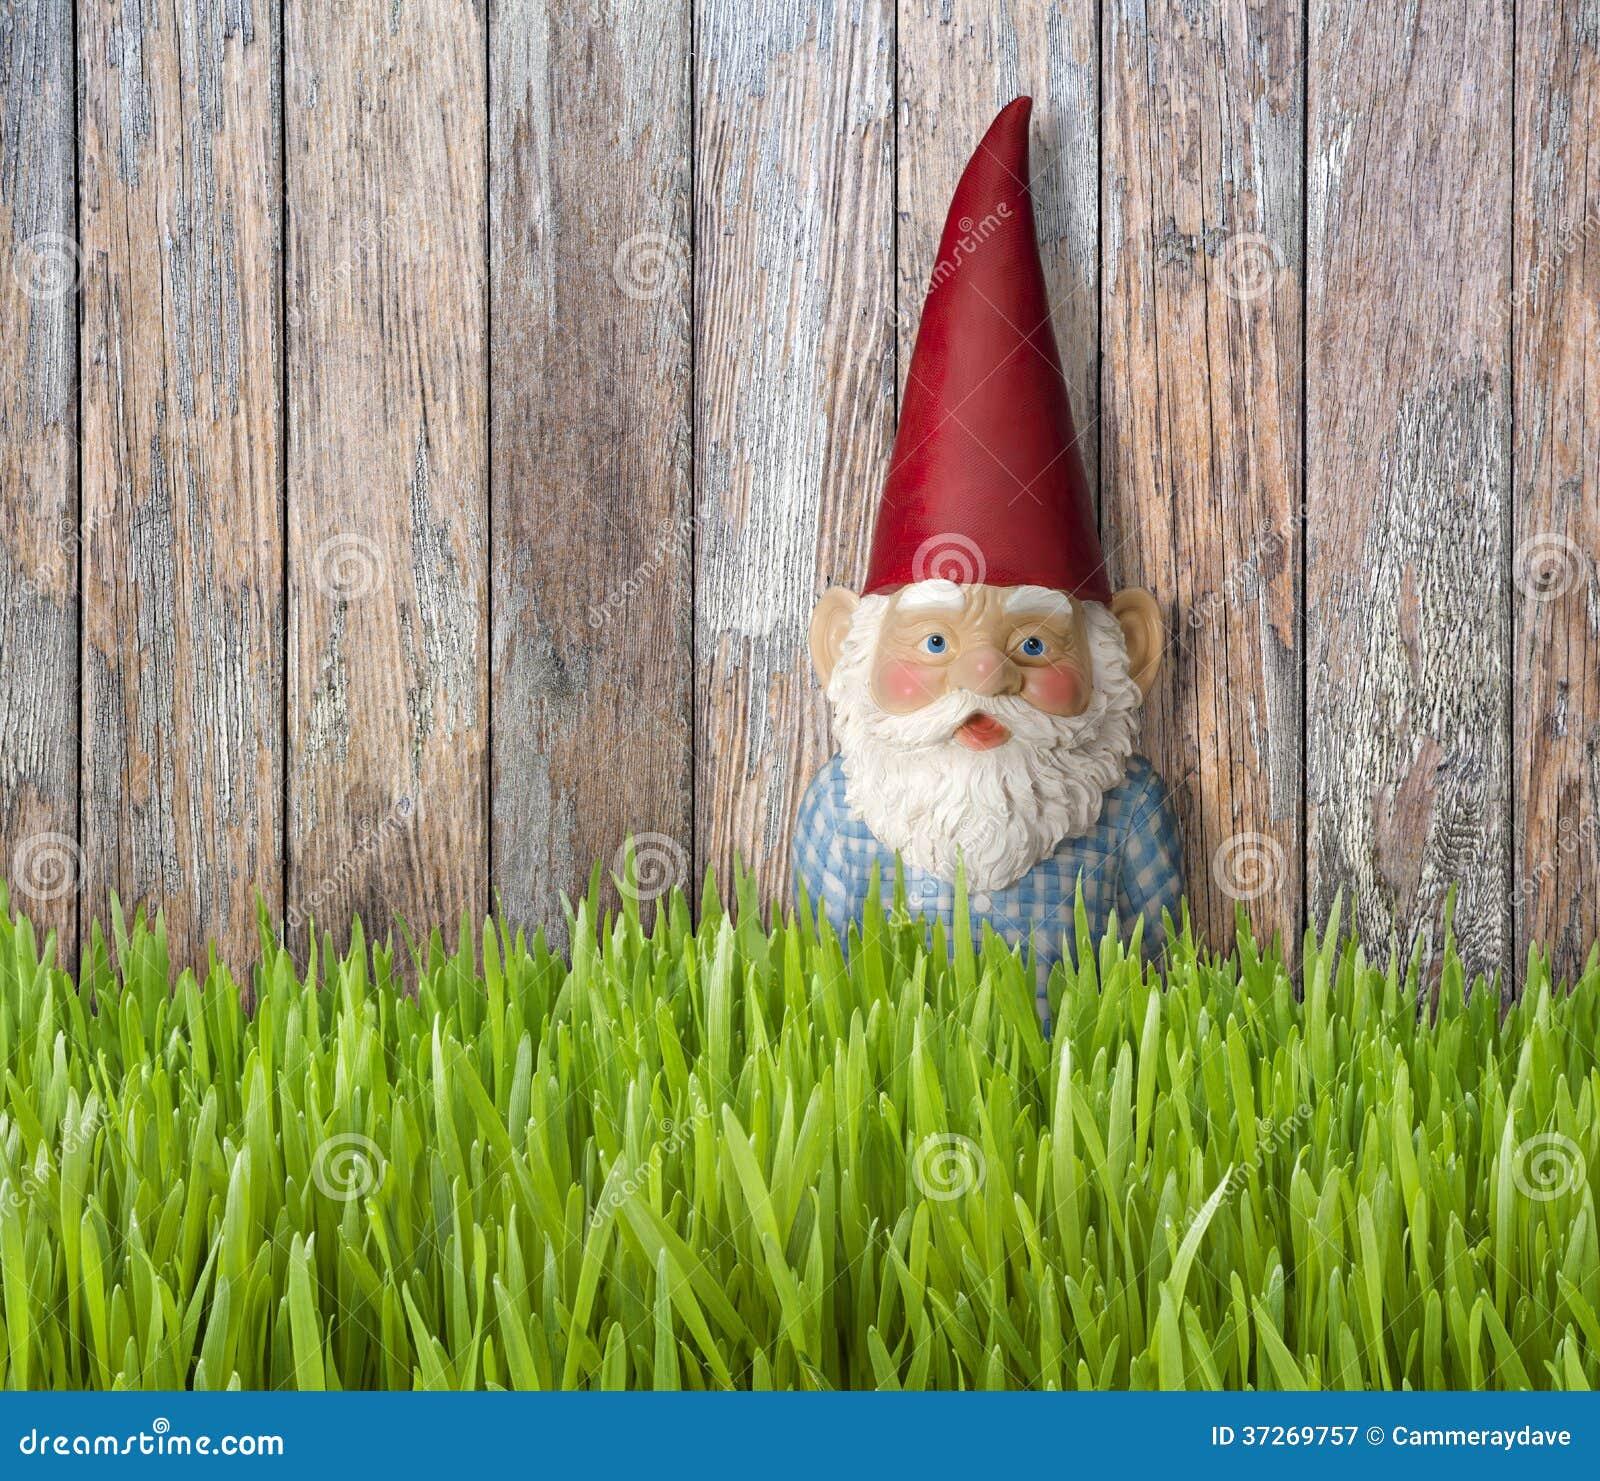 Gnome Grass Backyard Summer Background Royalty Free Stock